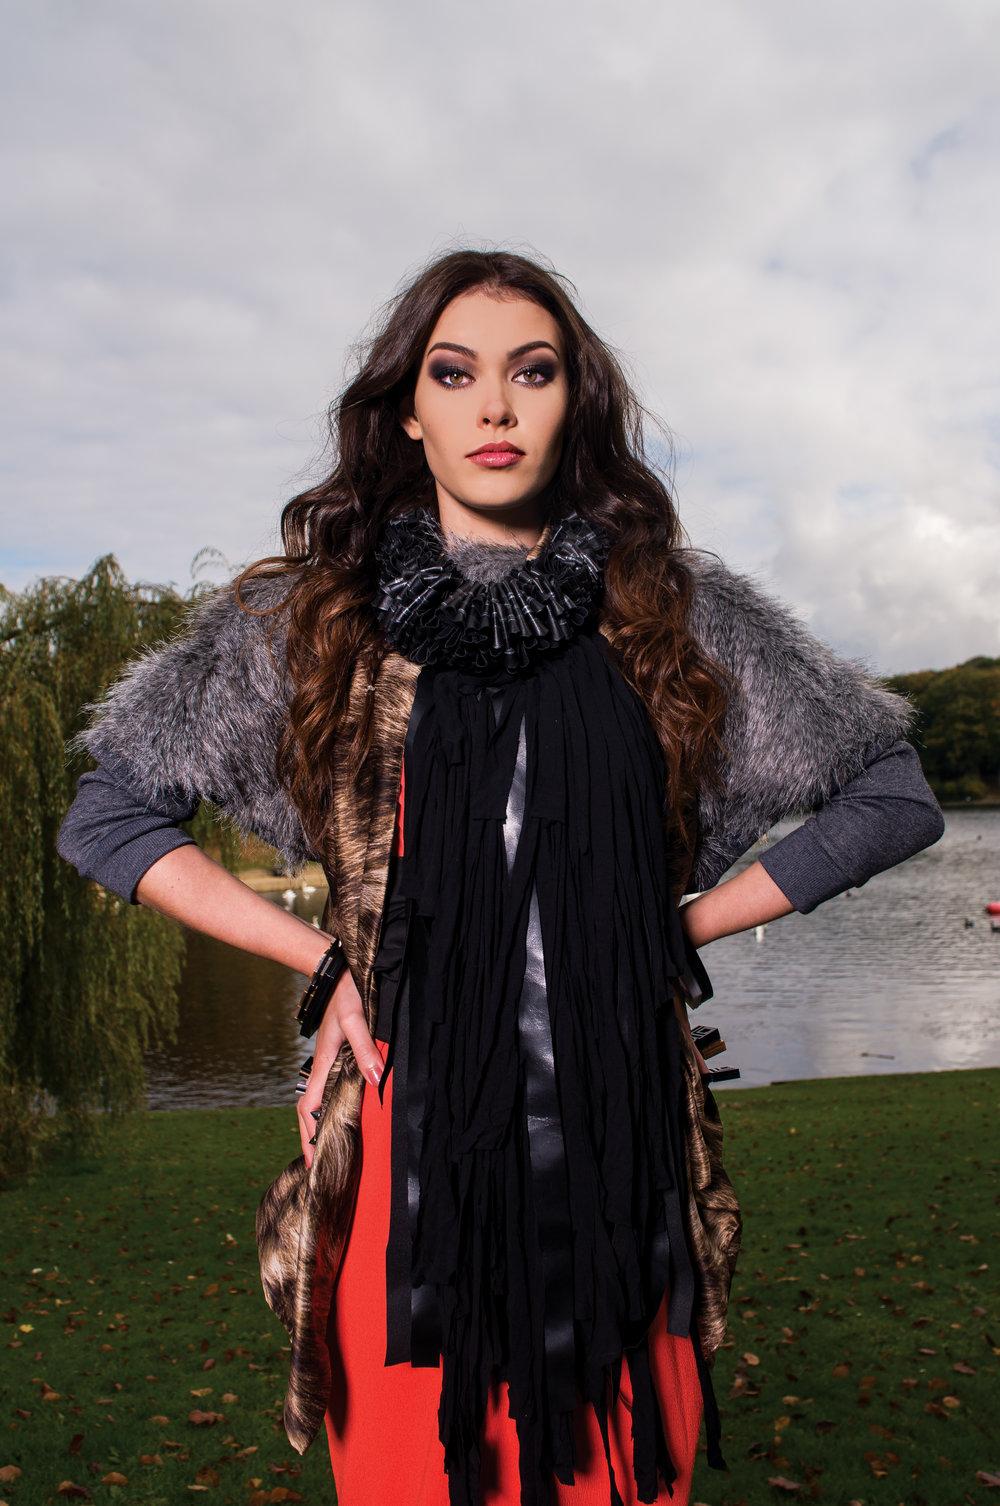 zaramia-ava-zaramiaava-leeds-fashion-designer-ethical-sustainable-tailored-minimalist-jacket-accent-coat-jacket-print-shirt-top-versatile-drape-cowl-styling-shop-womenswear-models-photoshoot-colour-8